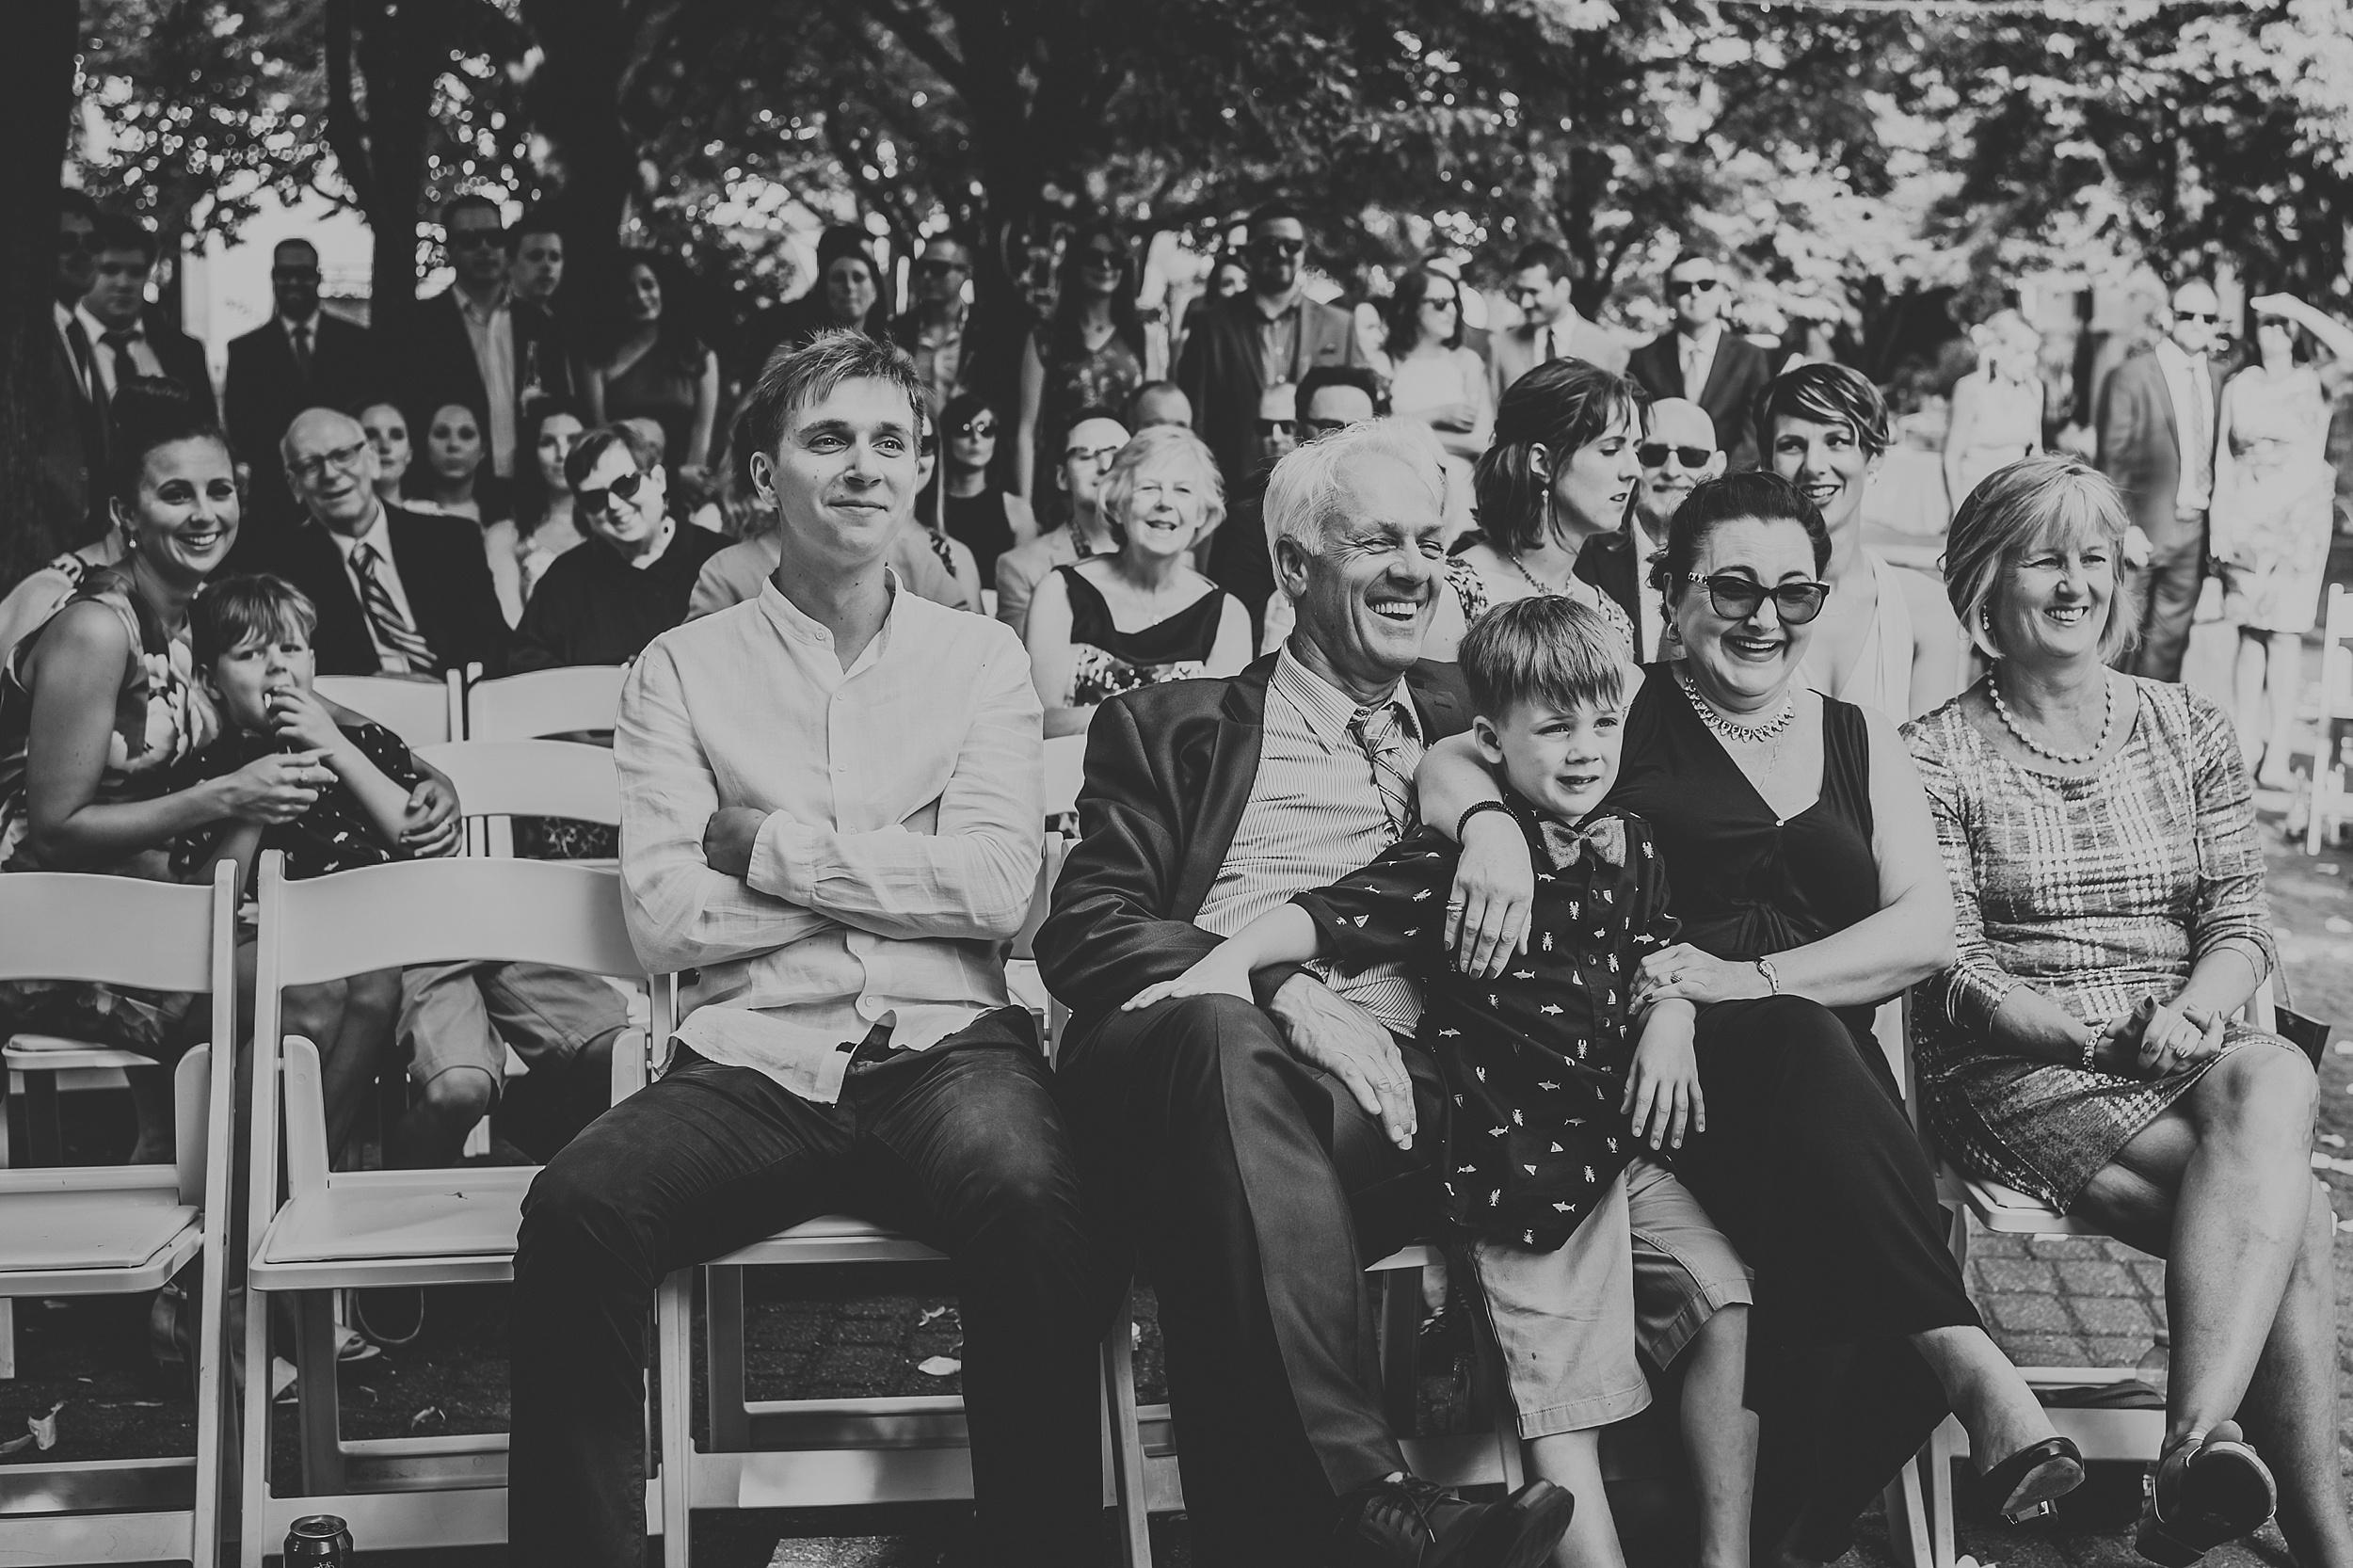 Sunnyside_Pavilion_Wedding_Toronto_Photographer_0047.jpg